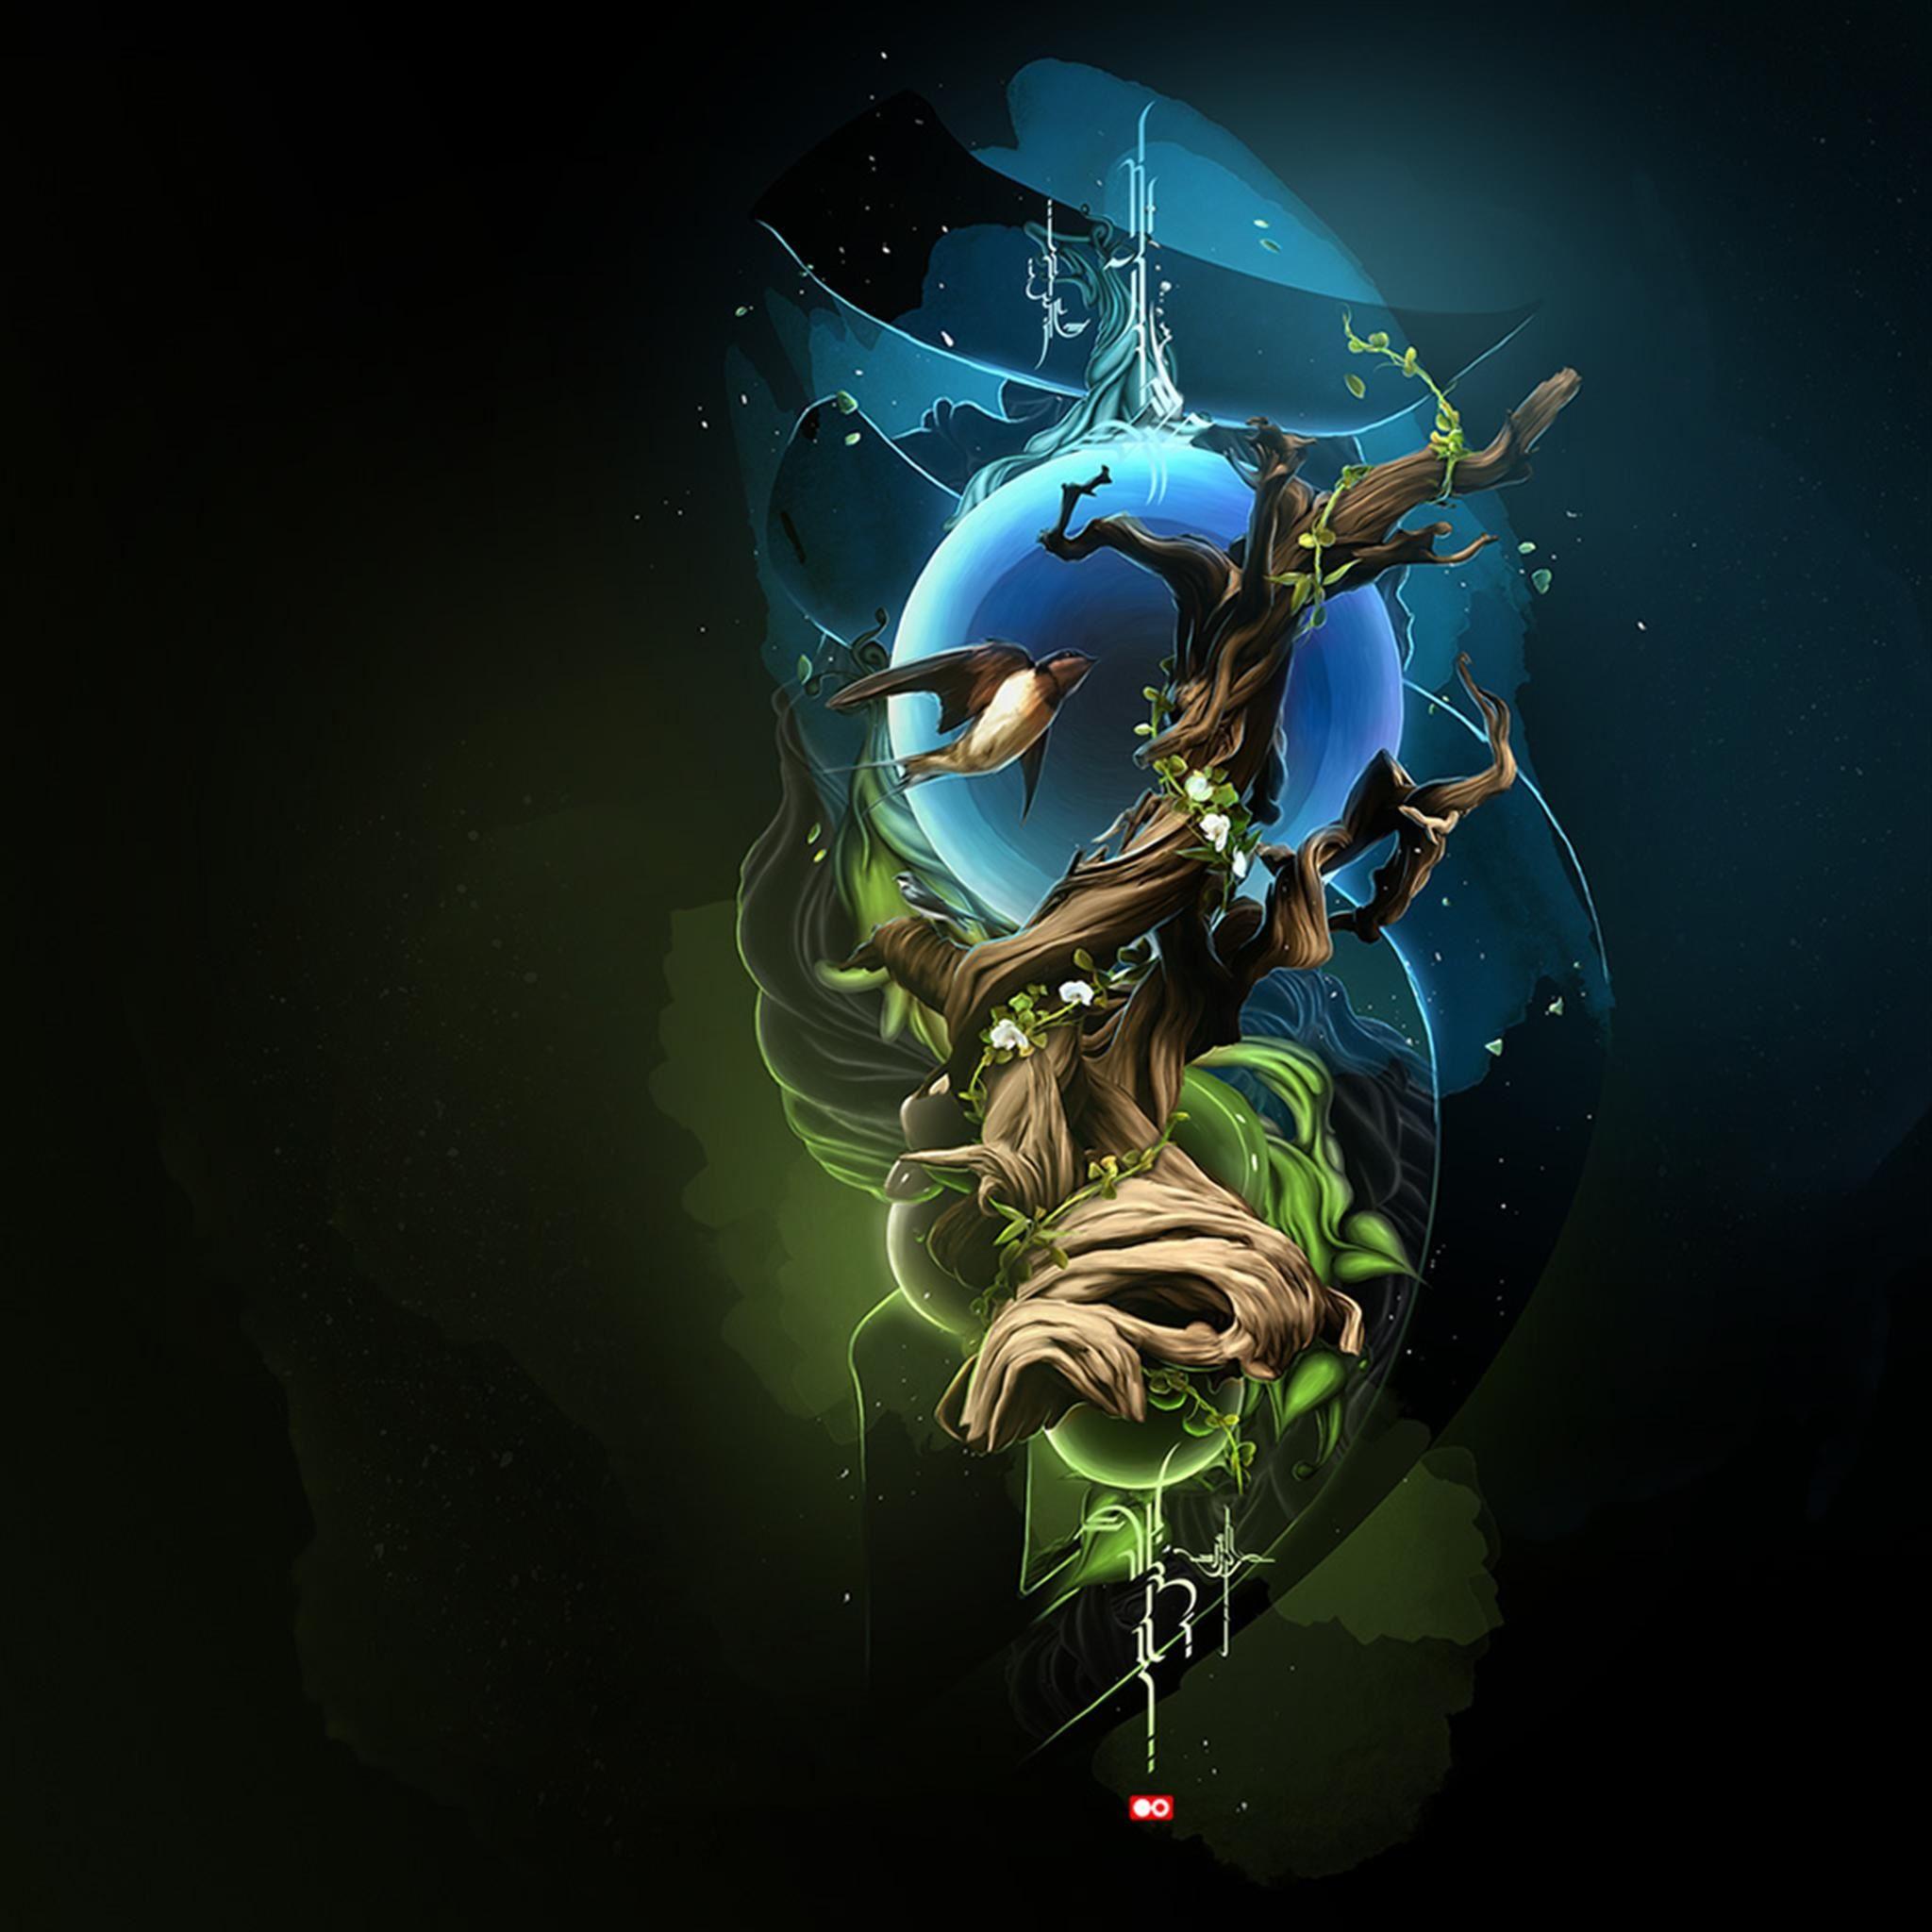 Fantasy Tree Design Art IPad Air Wallpapers Free Download